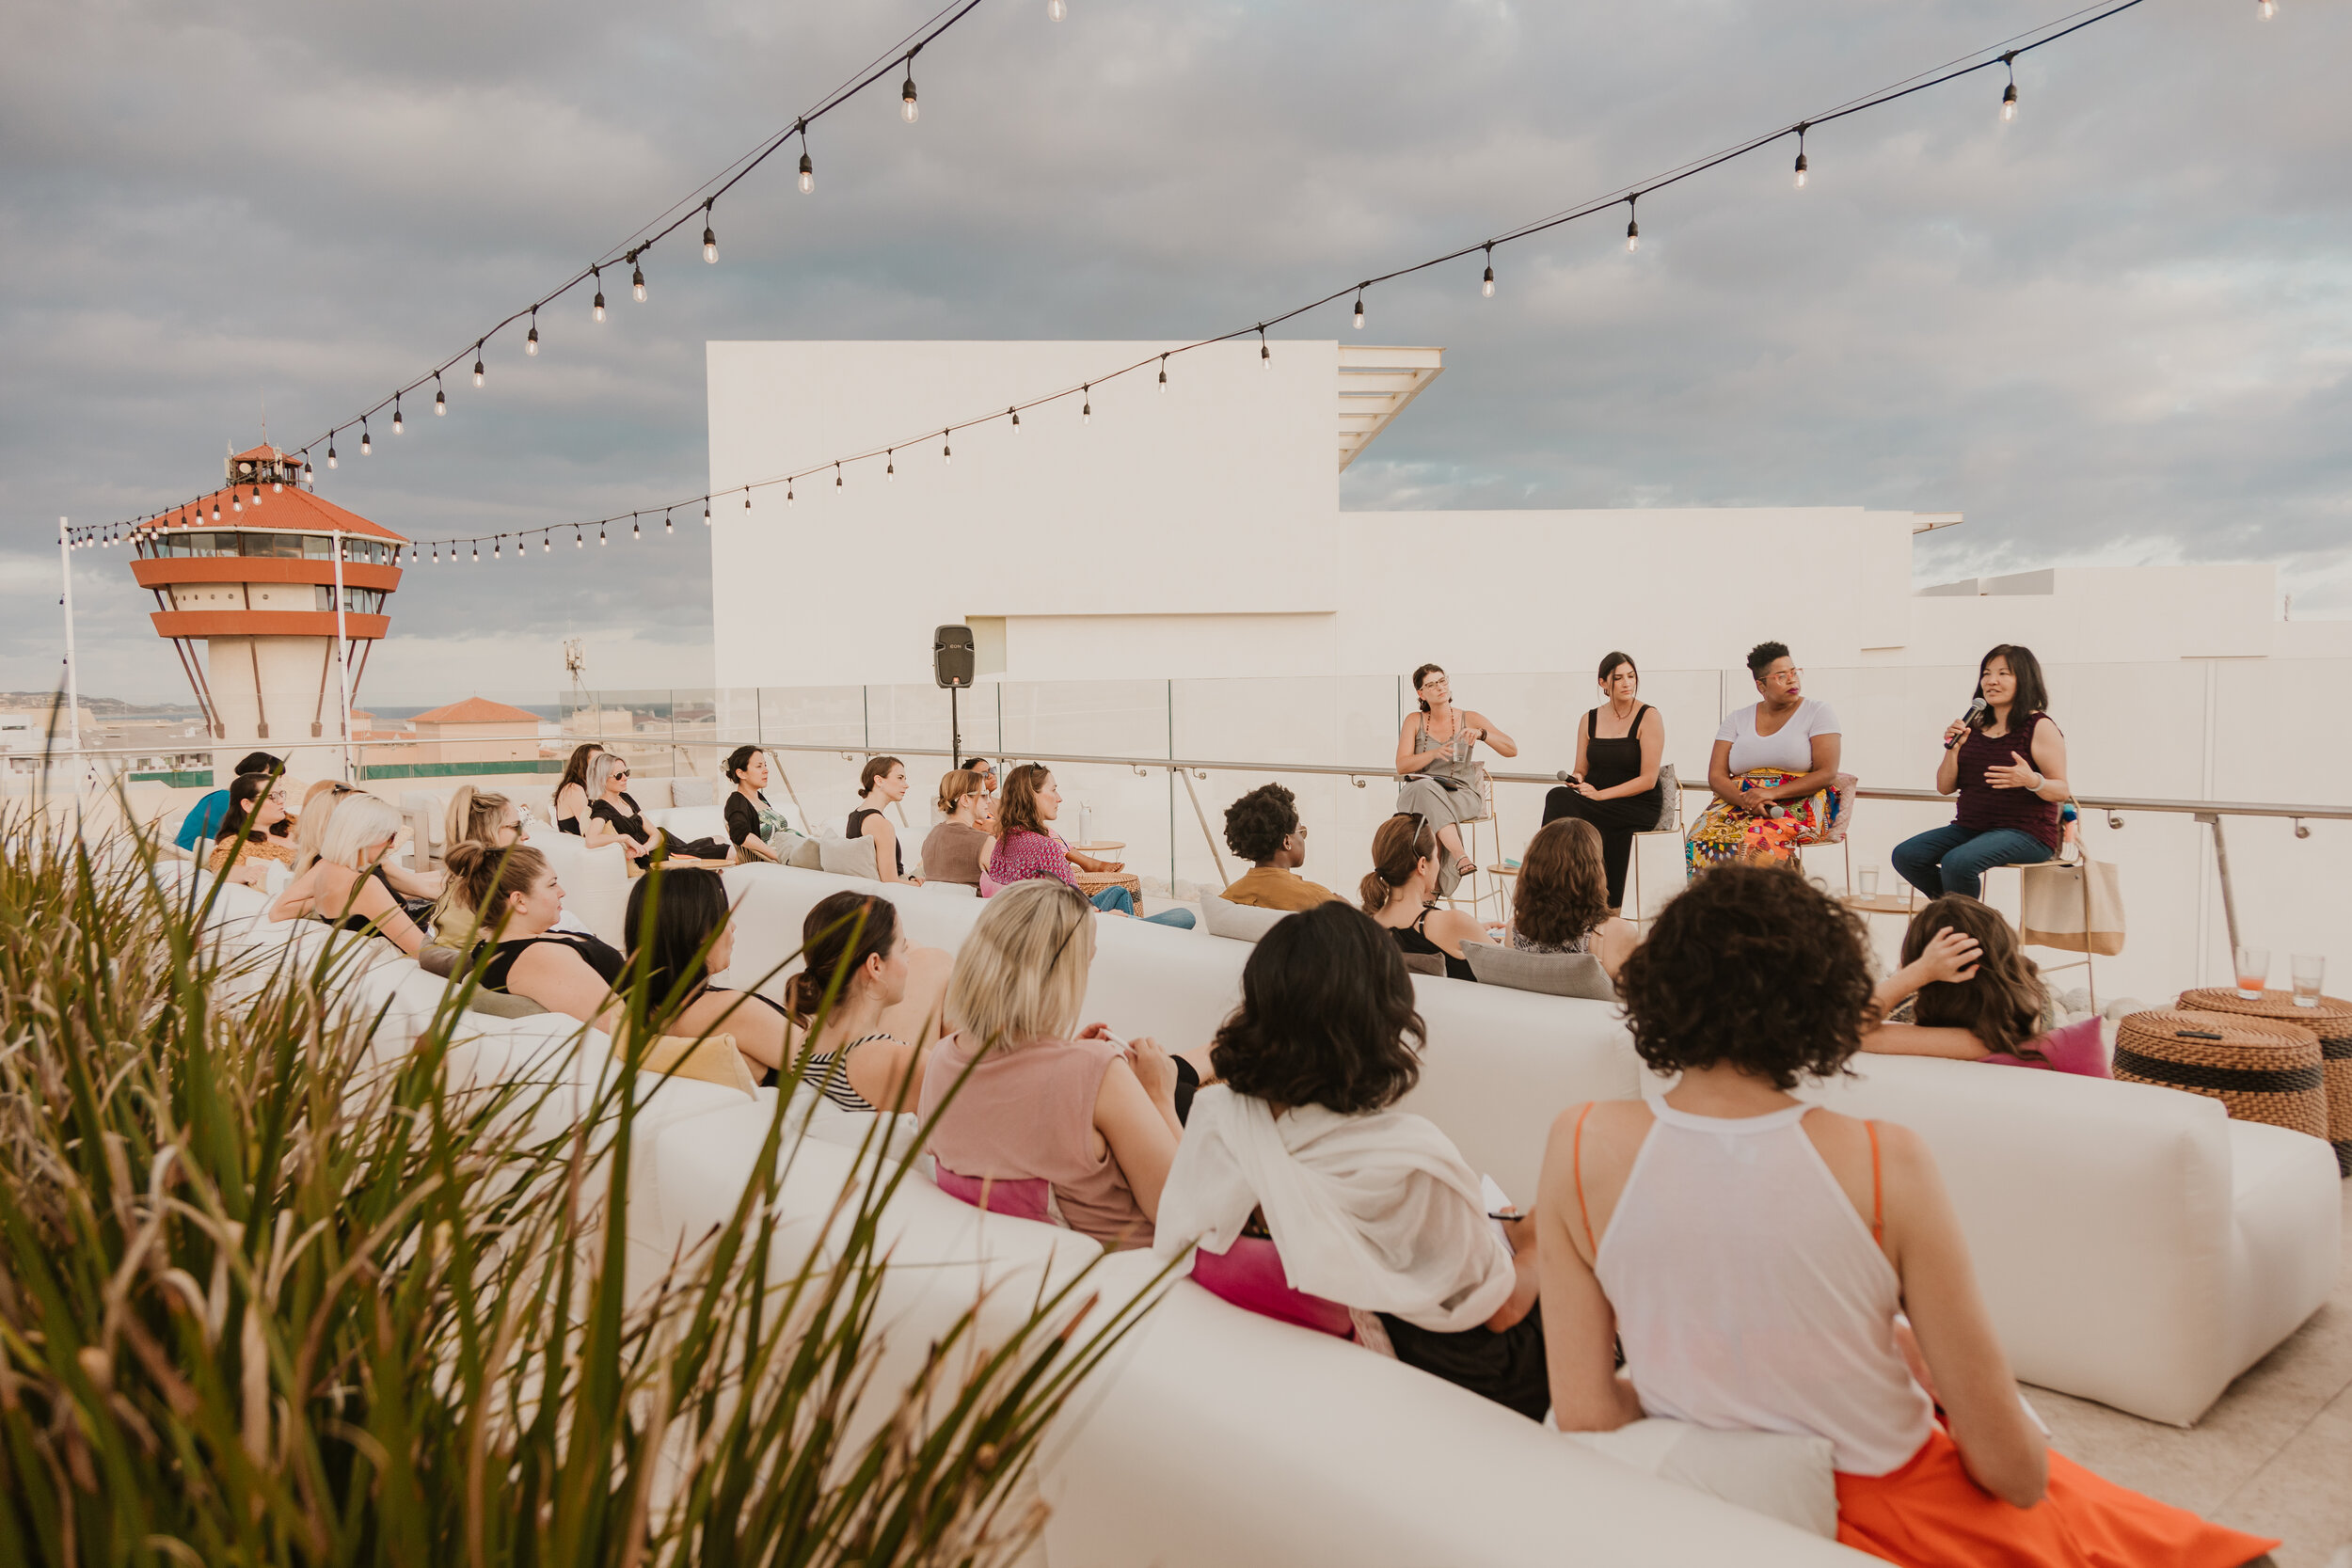 Women on panel on rooftop